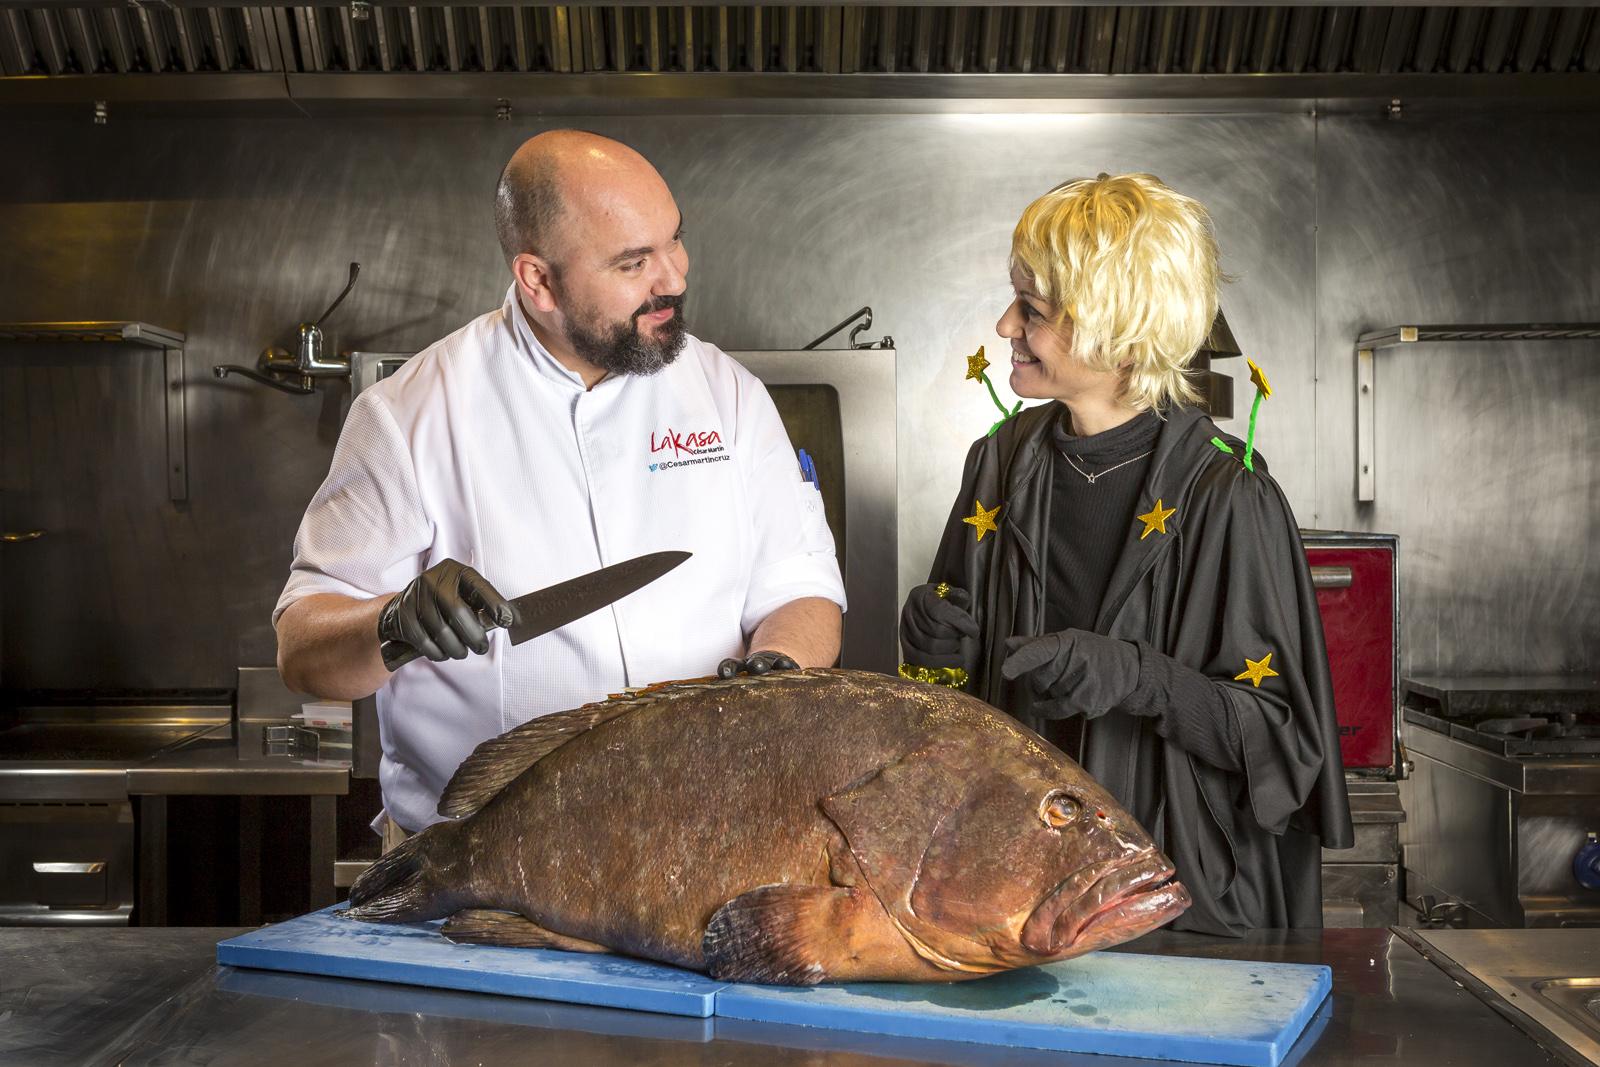 Roasted grouper